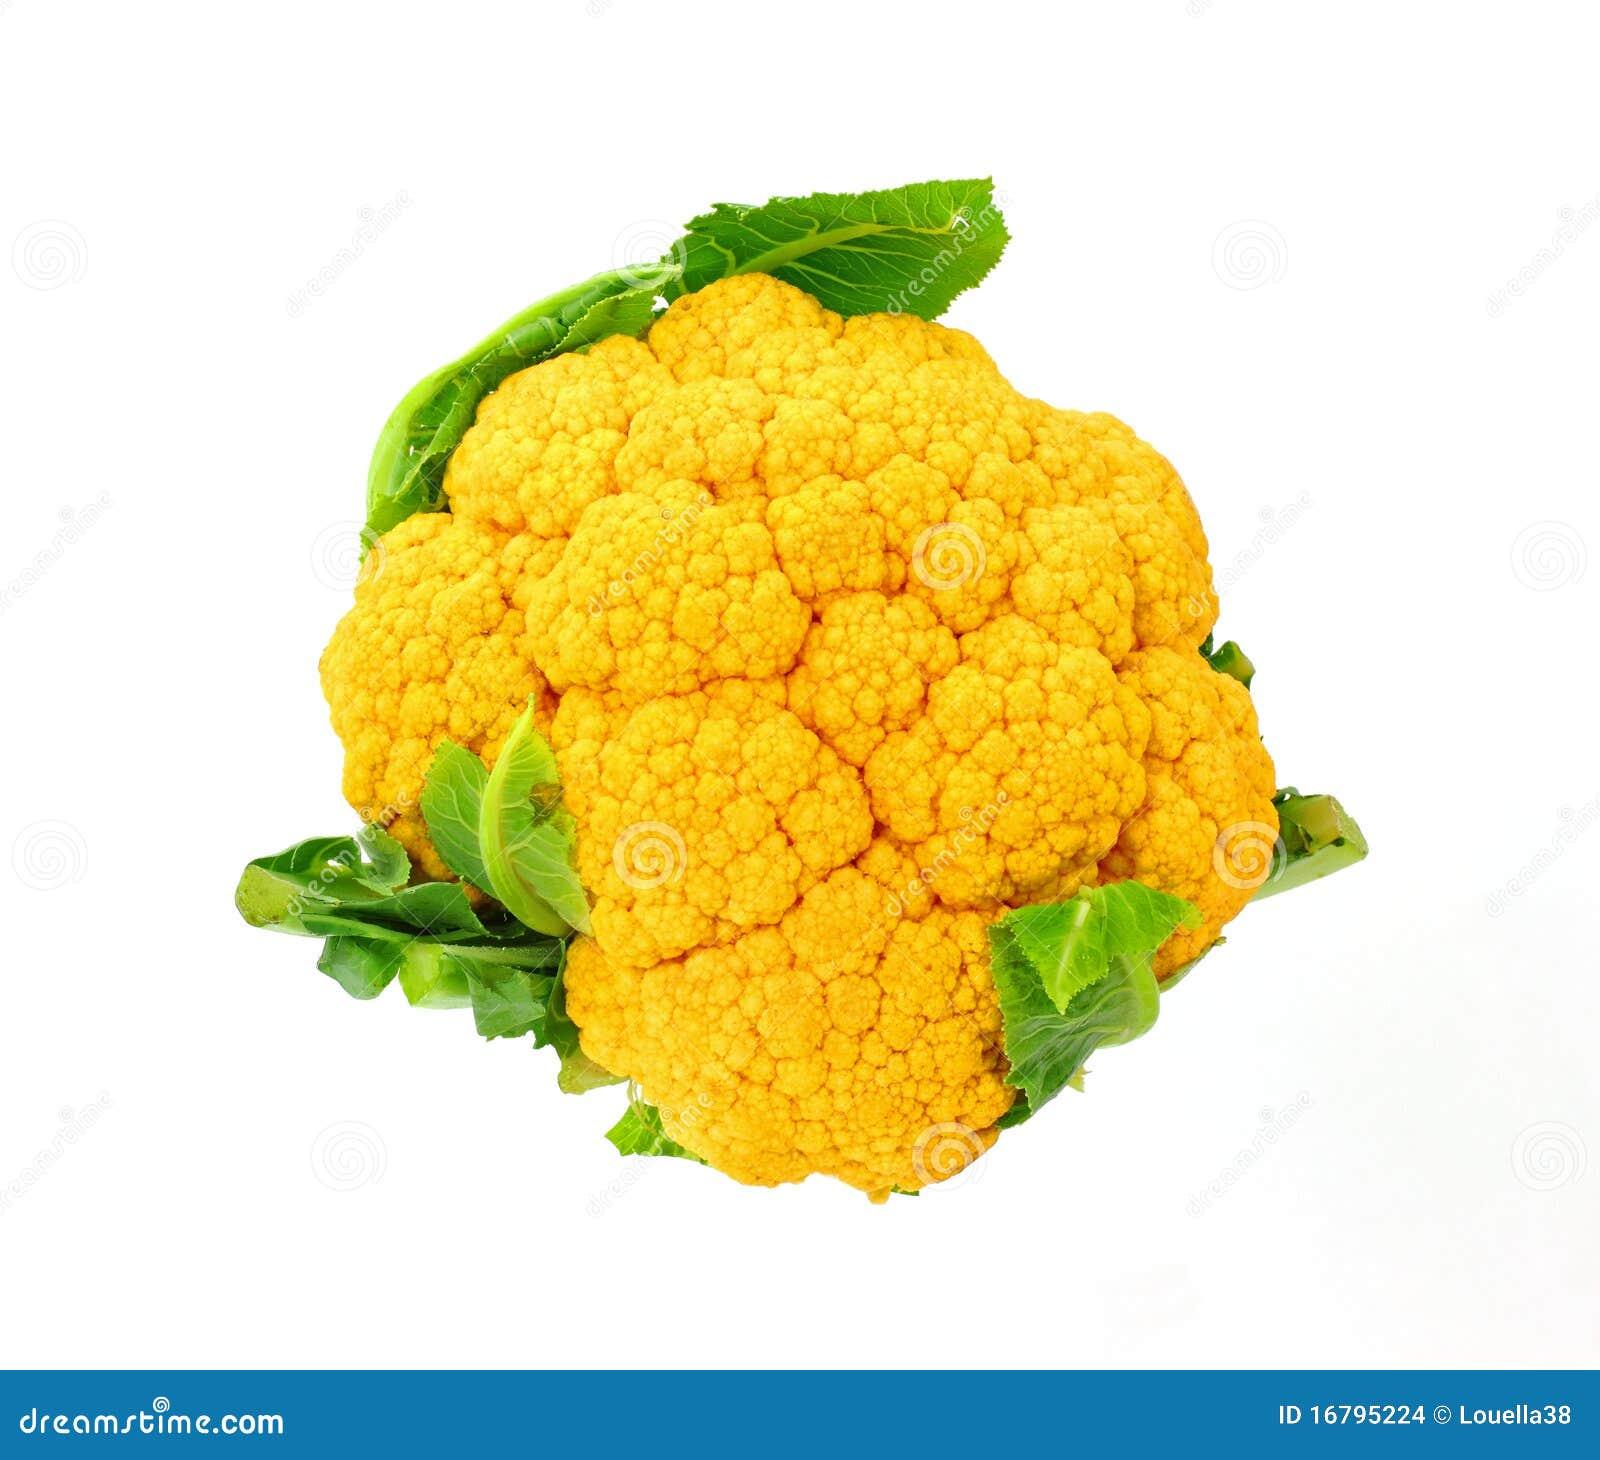 Seul Chou Fleur Orange Photo Stock Image Du Ajoute Groupes 16795224